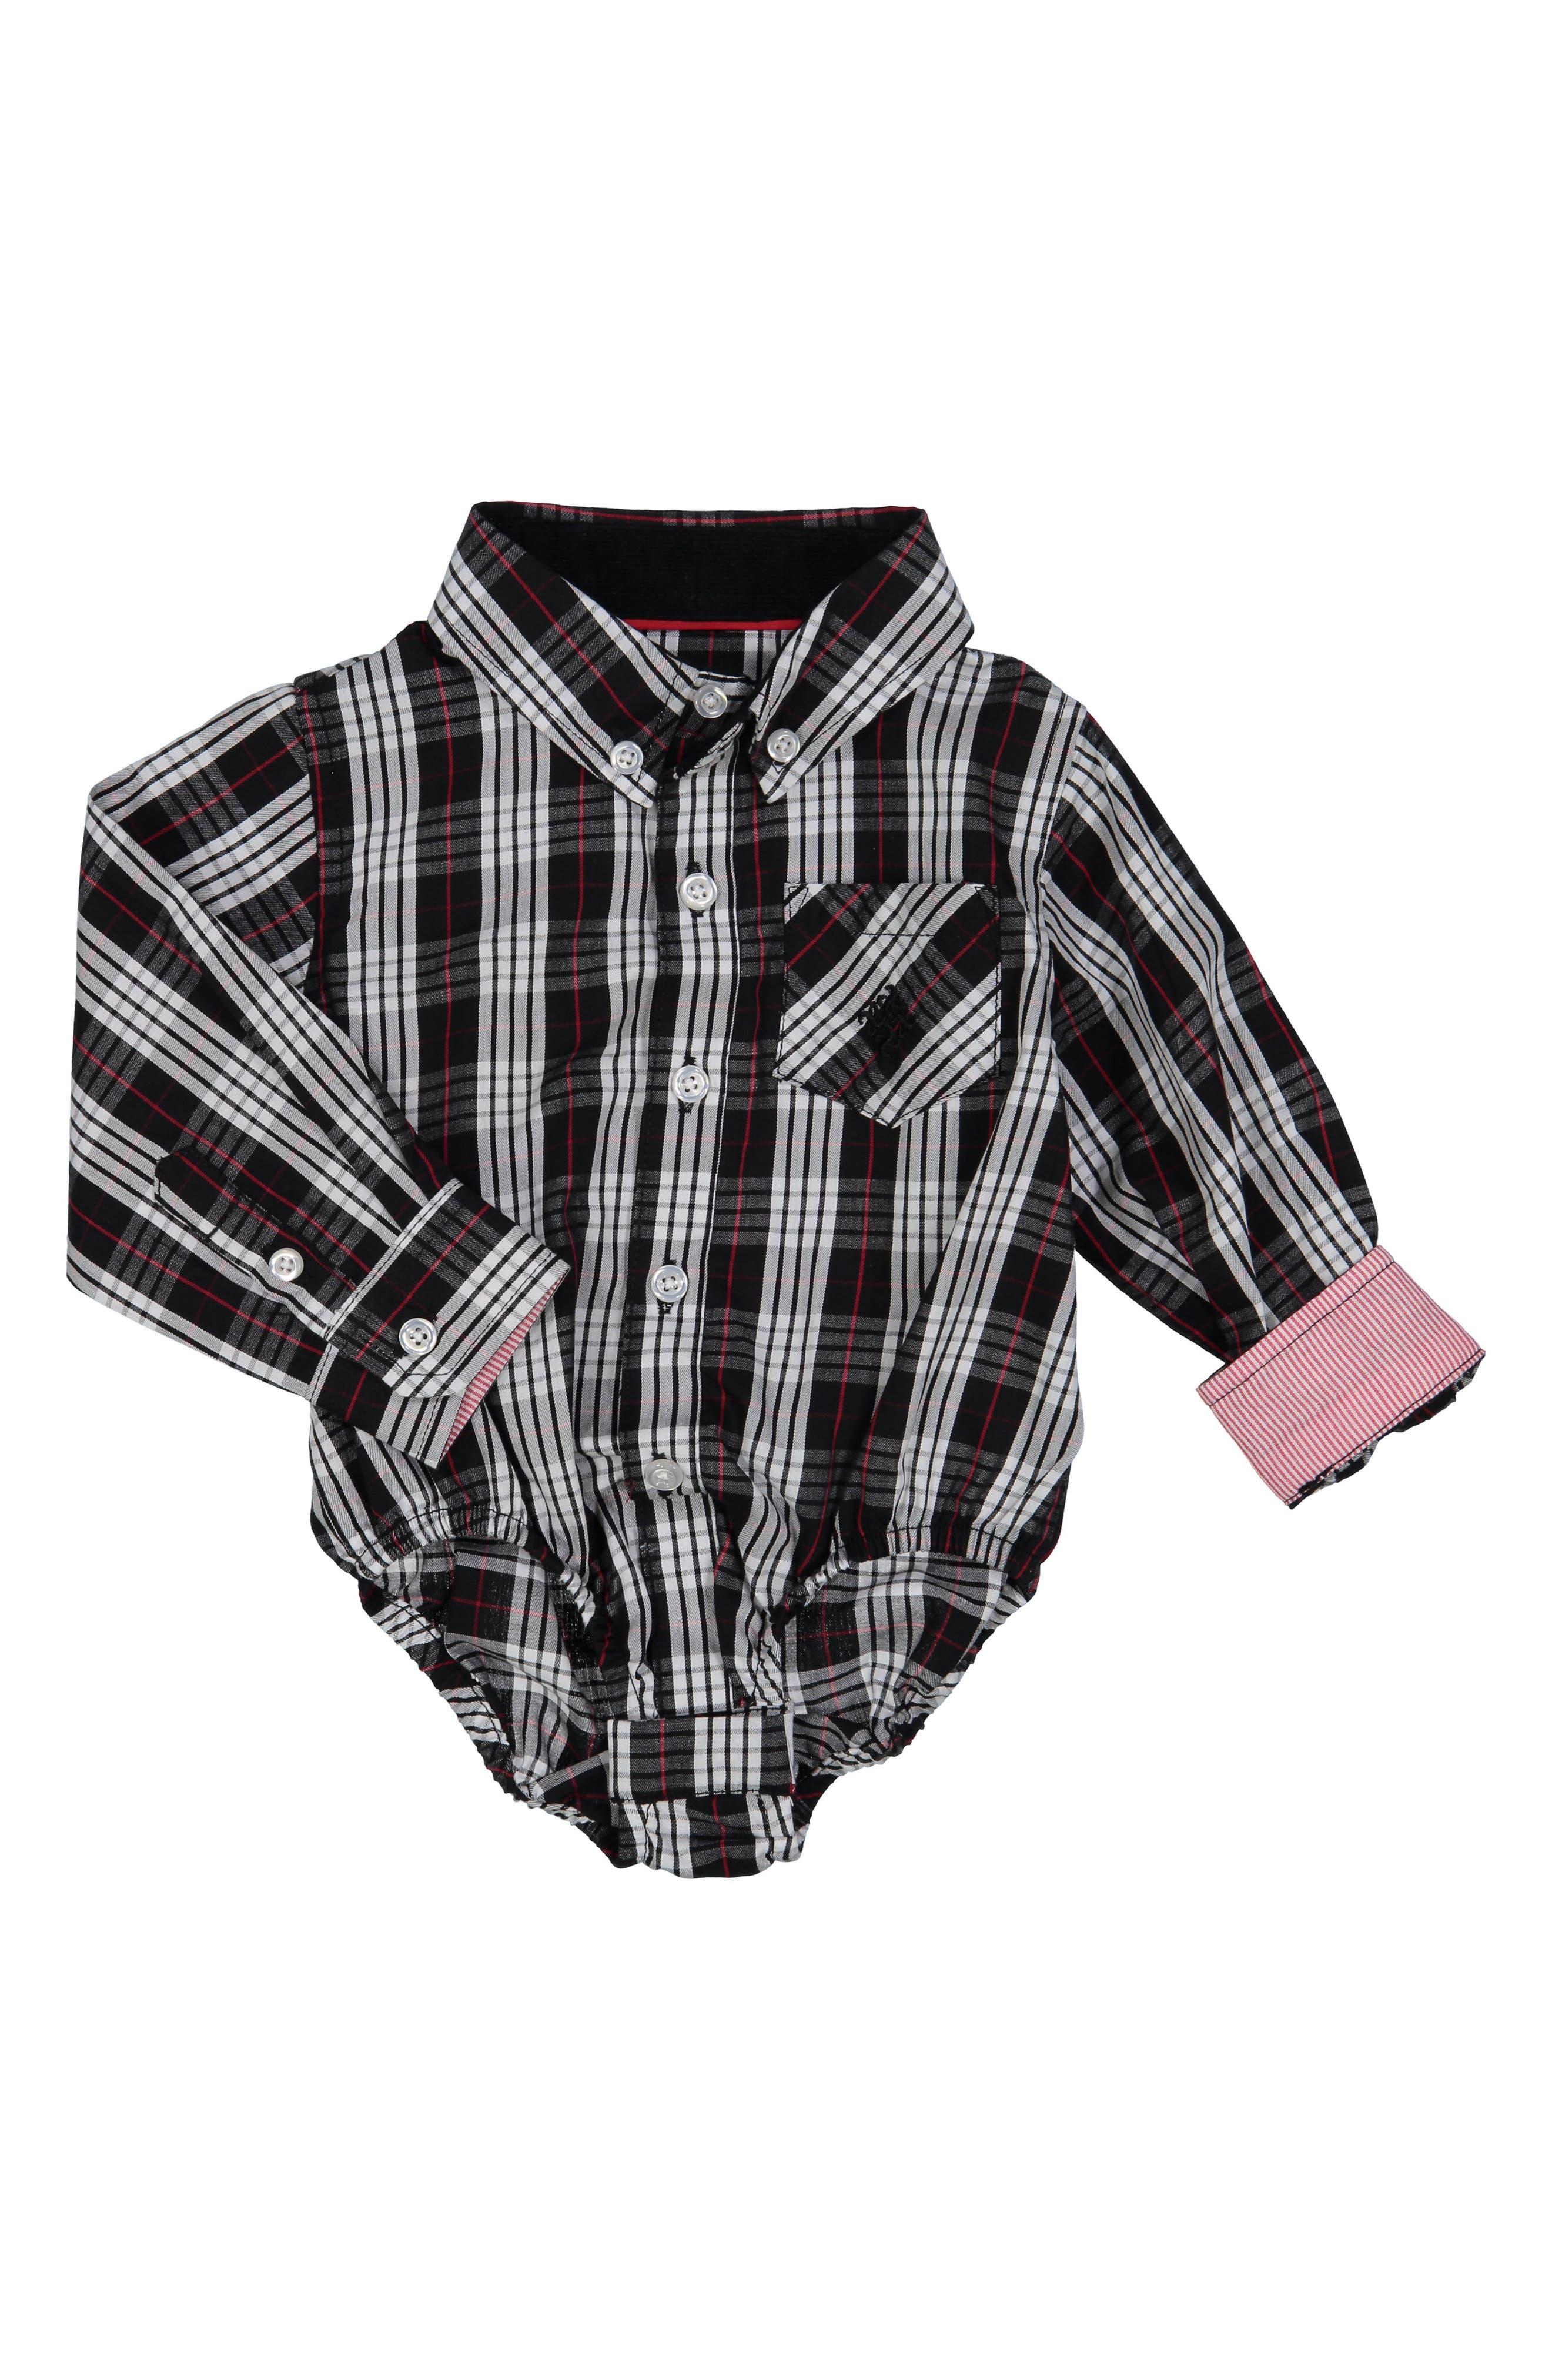 Shirtzie Holiday Check Bodysuit,                             Main thumbnail 1, color,                             002